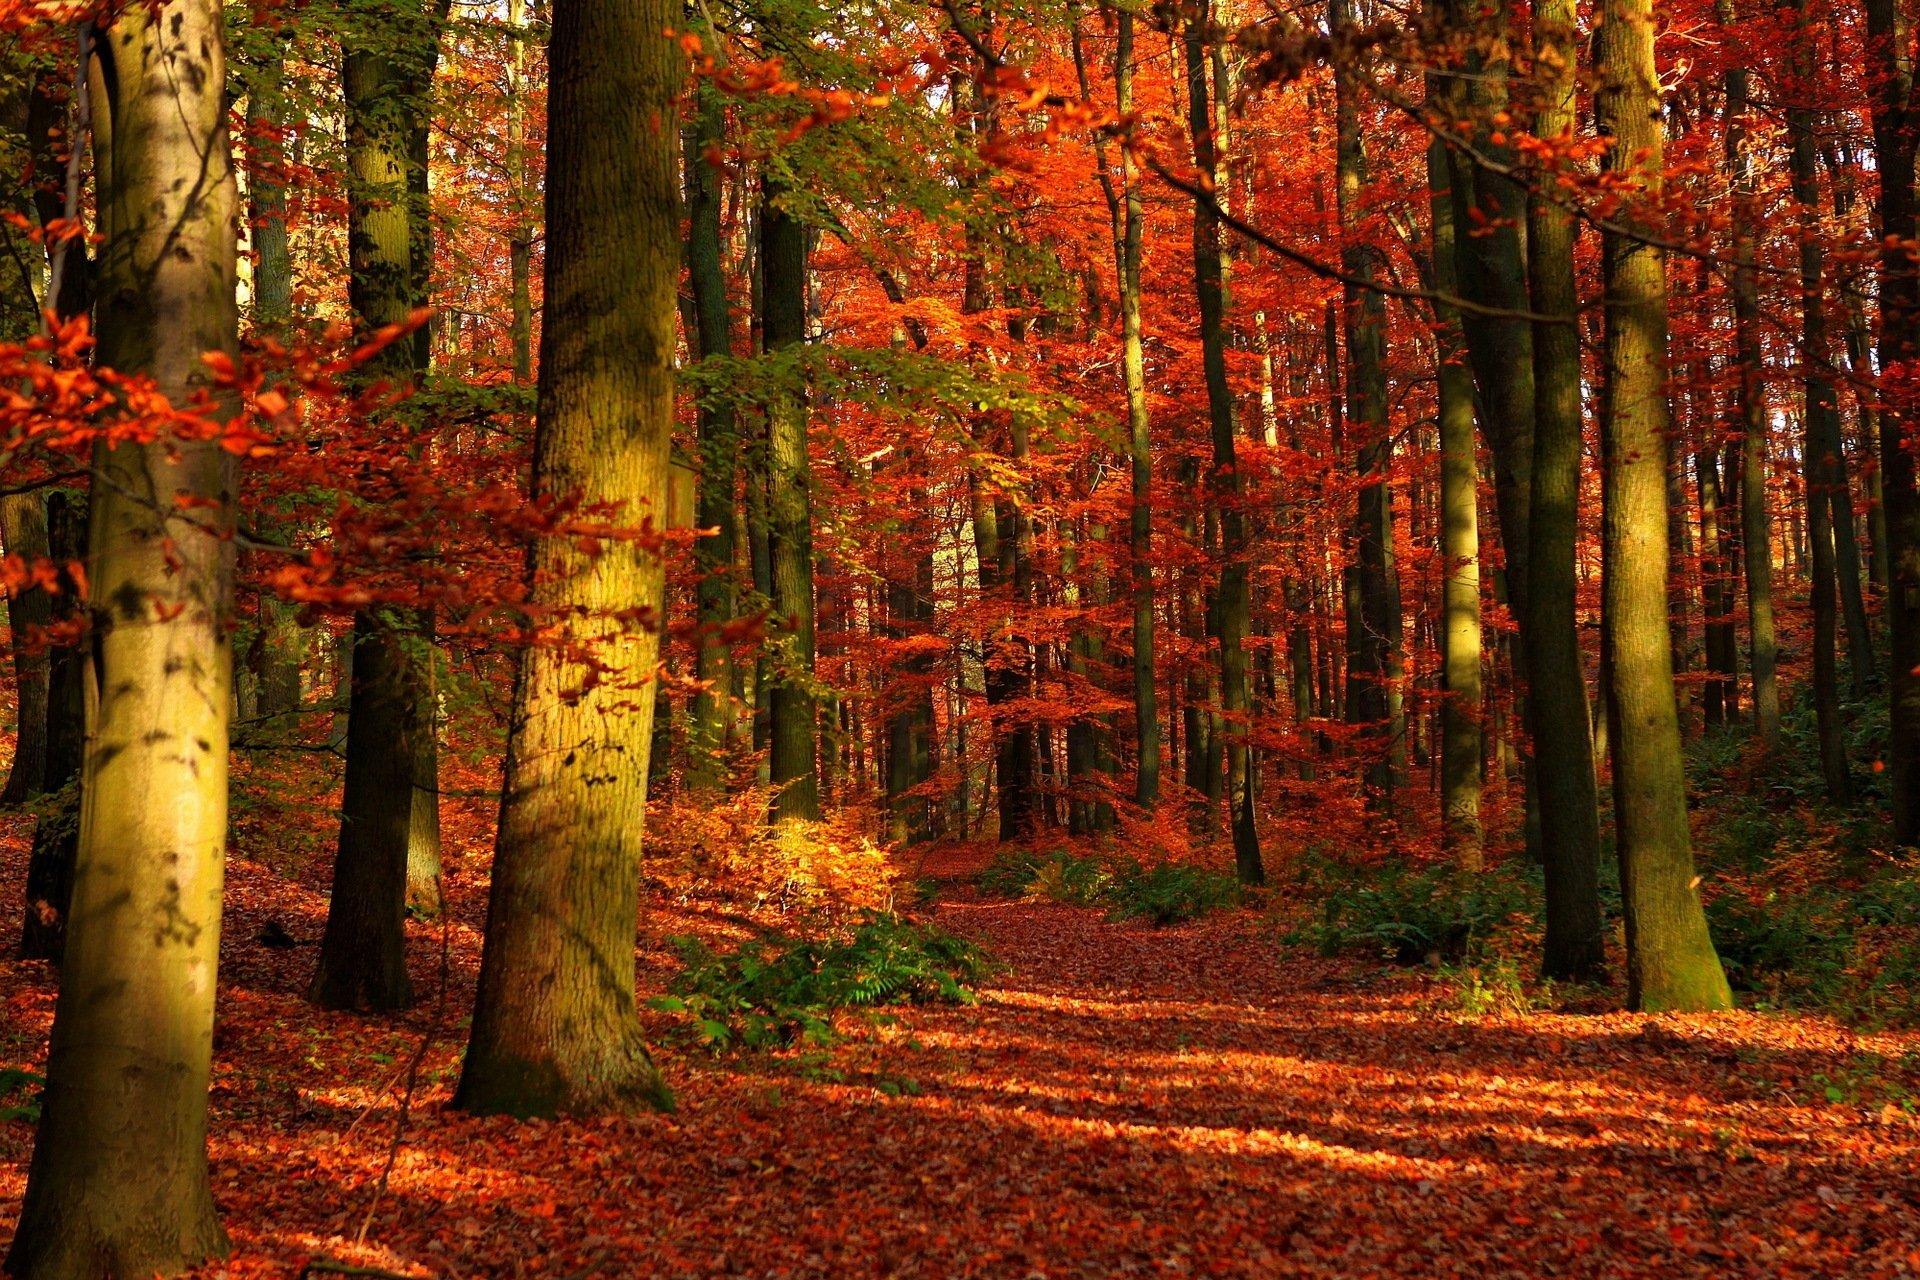 роналду осенний лес фото картинки на рабочий стол рано или поздно